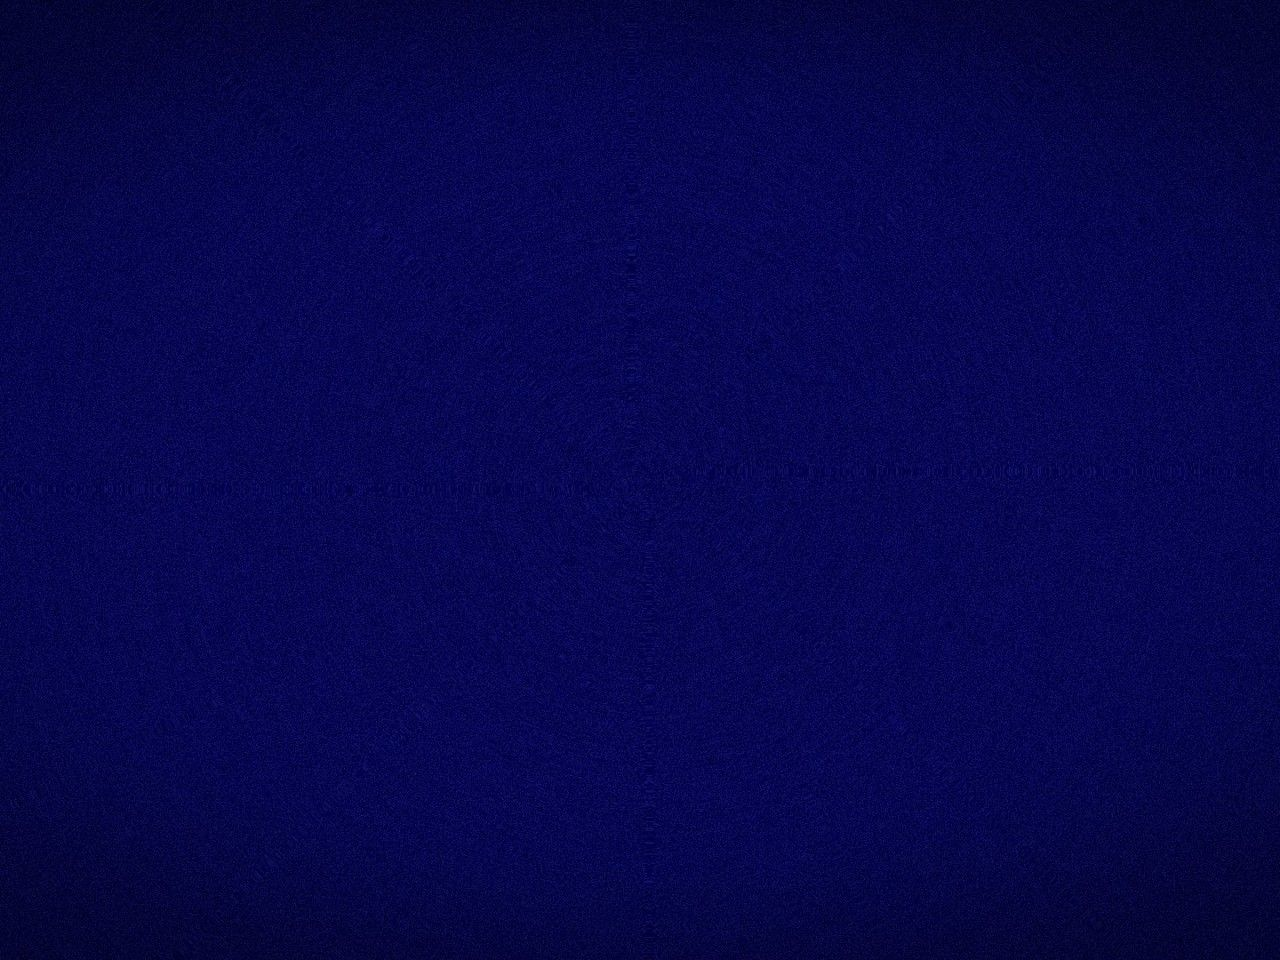 Download Wallpaper 1280x960 Surface Solid Blue Dark 1280x960 Hd Background Tardis Blue Hex Colors Pantone